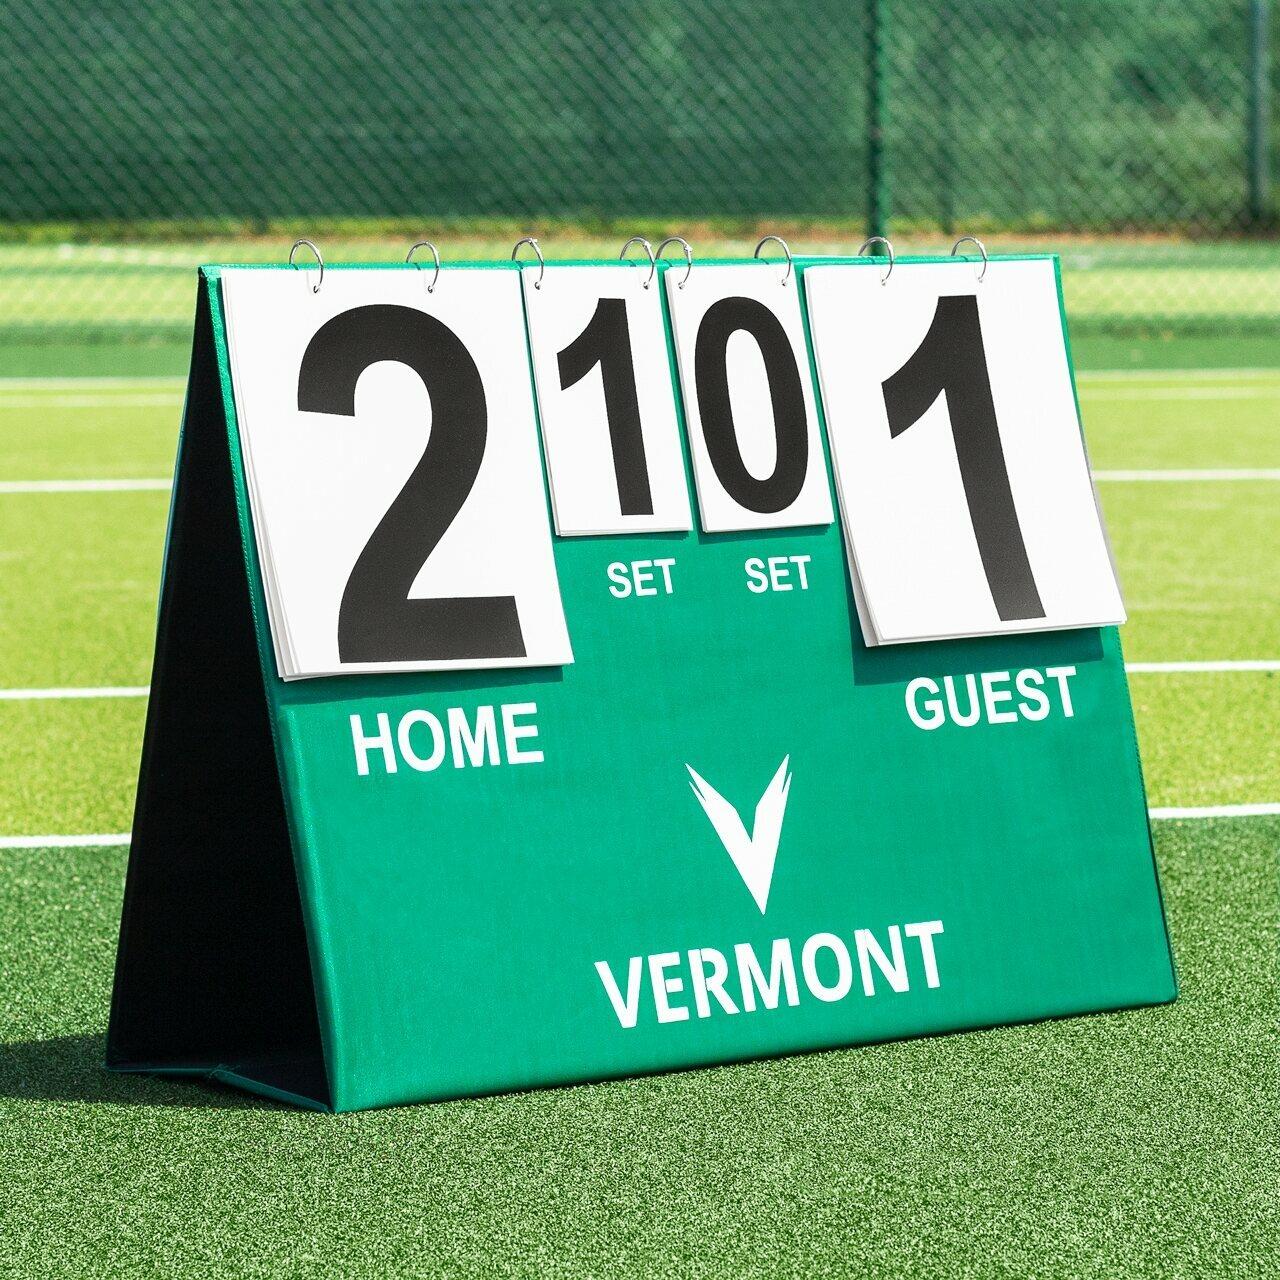 Vermont Portable Tennis Scoreboard